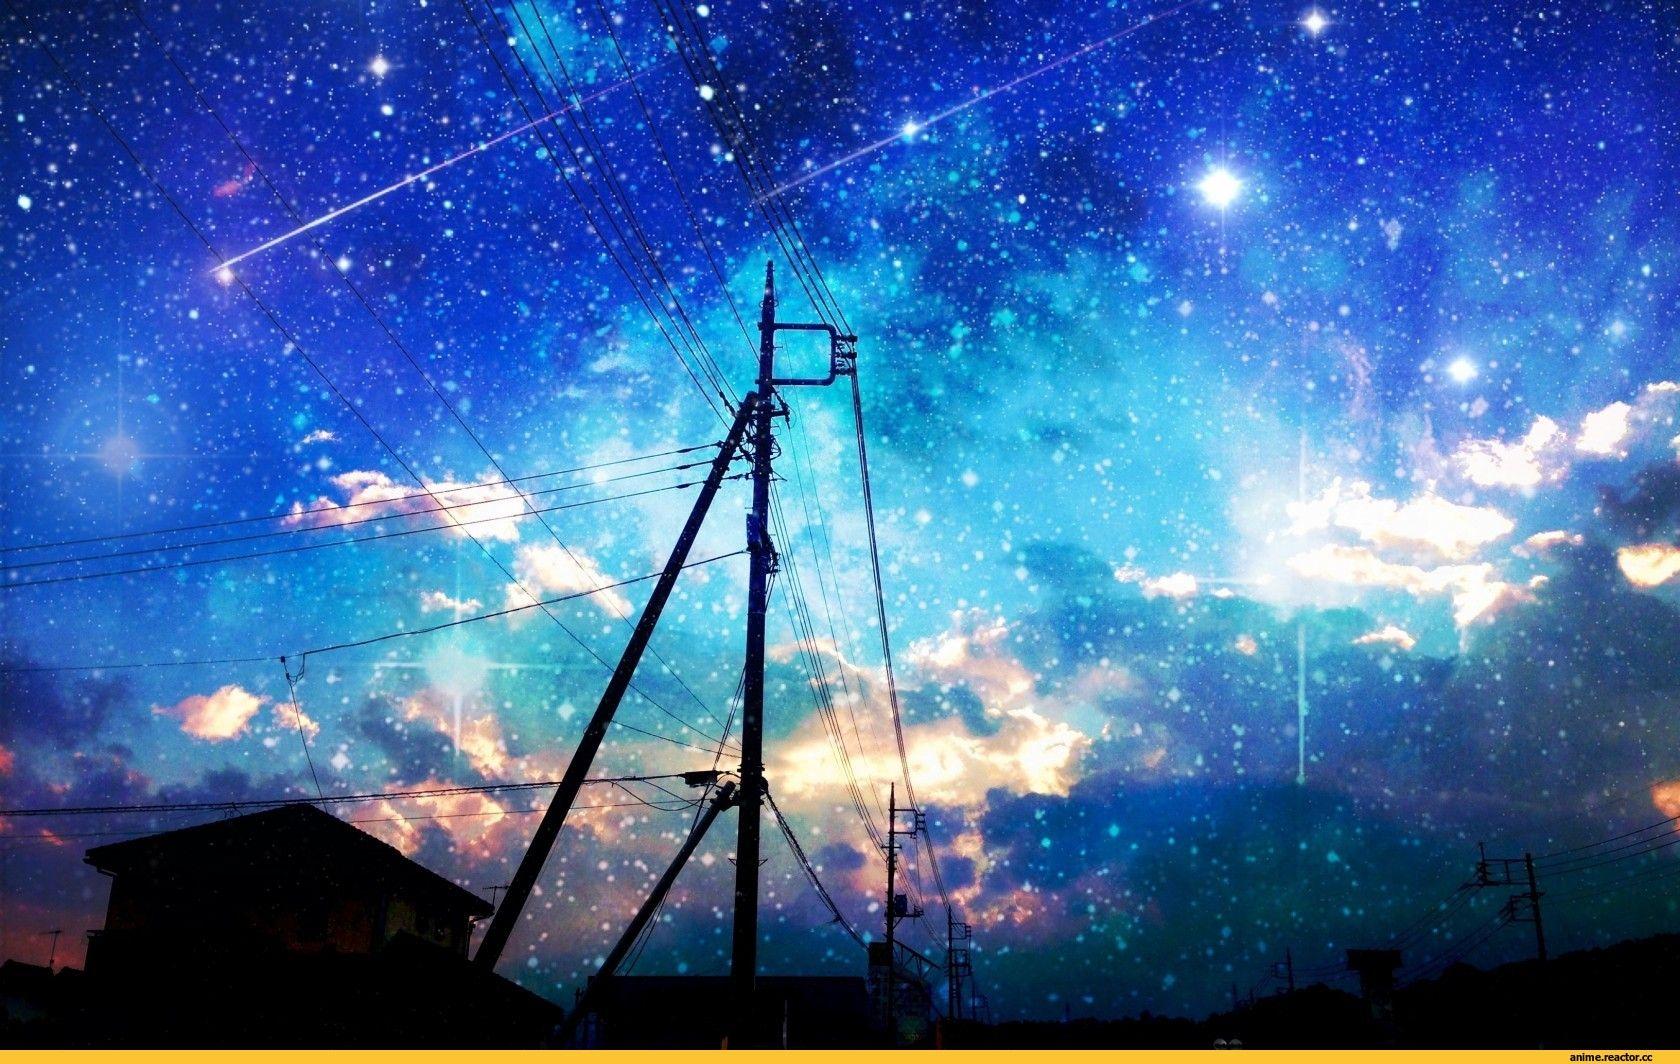 Fantasy おしゃれまとめの人気アイデア Pinterest Variathecat 星空 イラスト 空中都市 夜空 イラスト